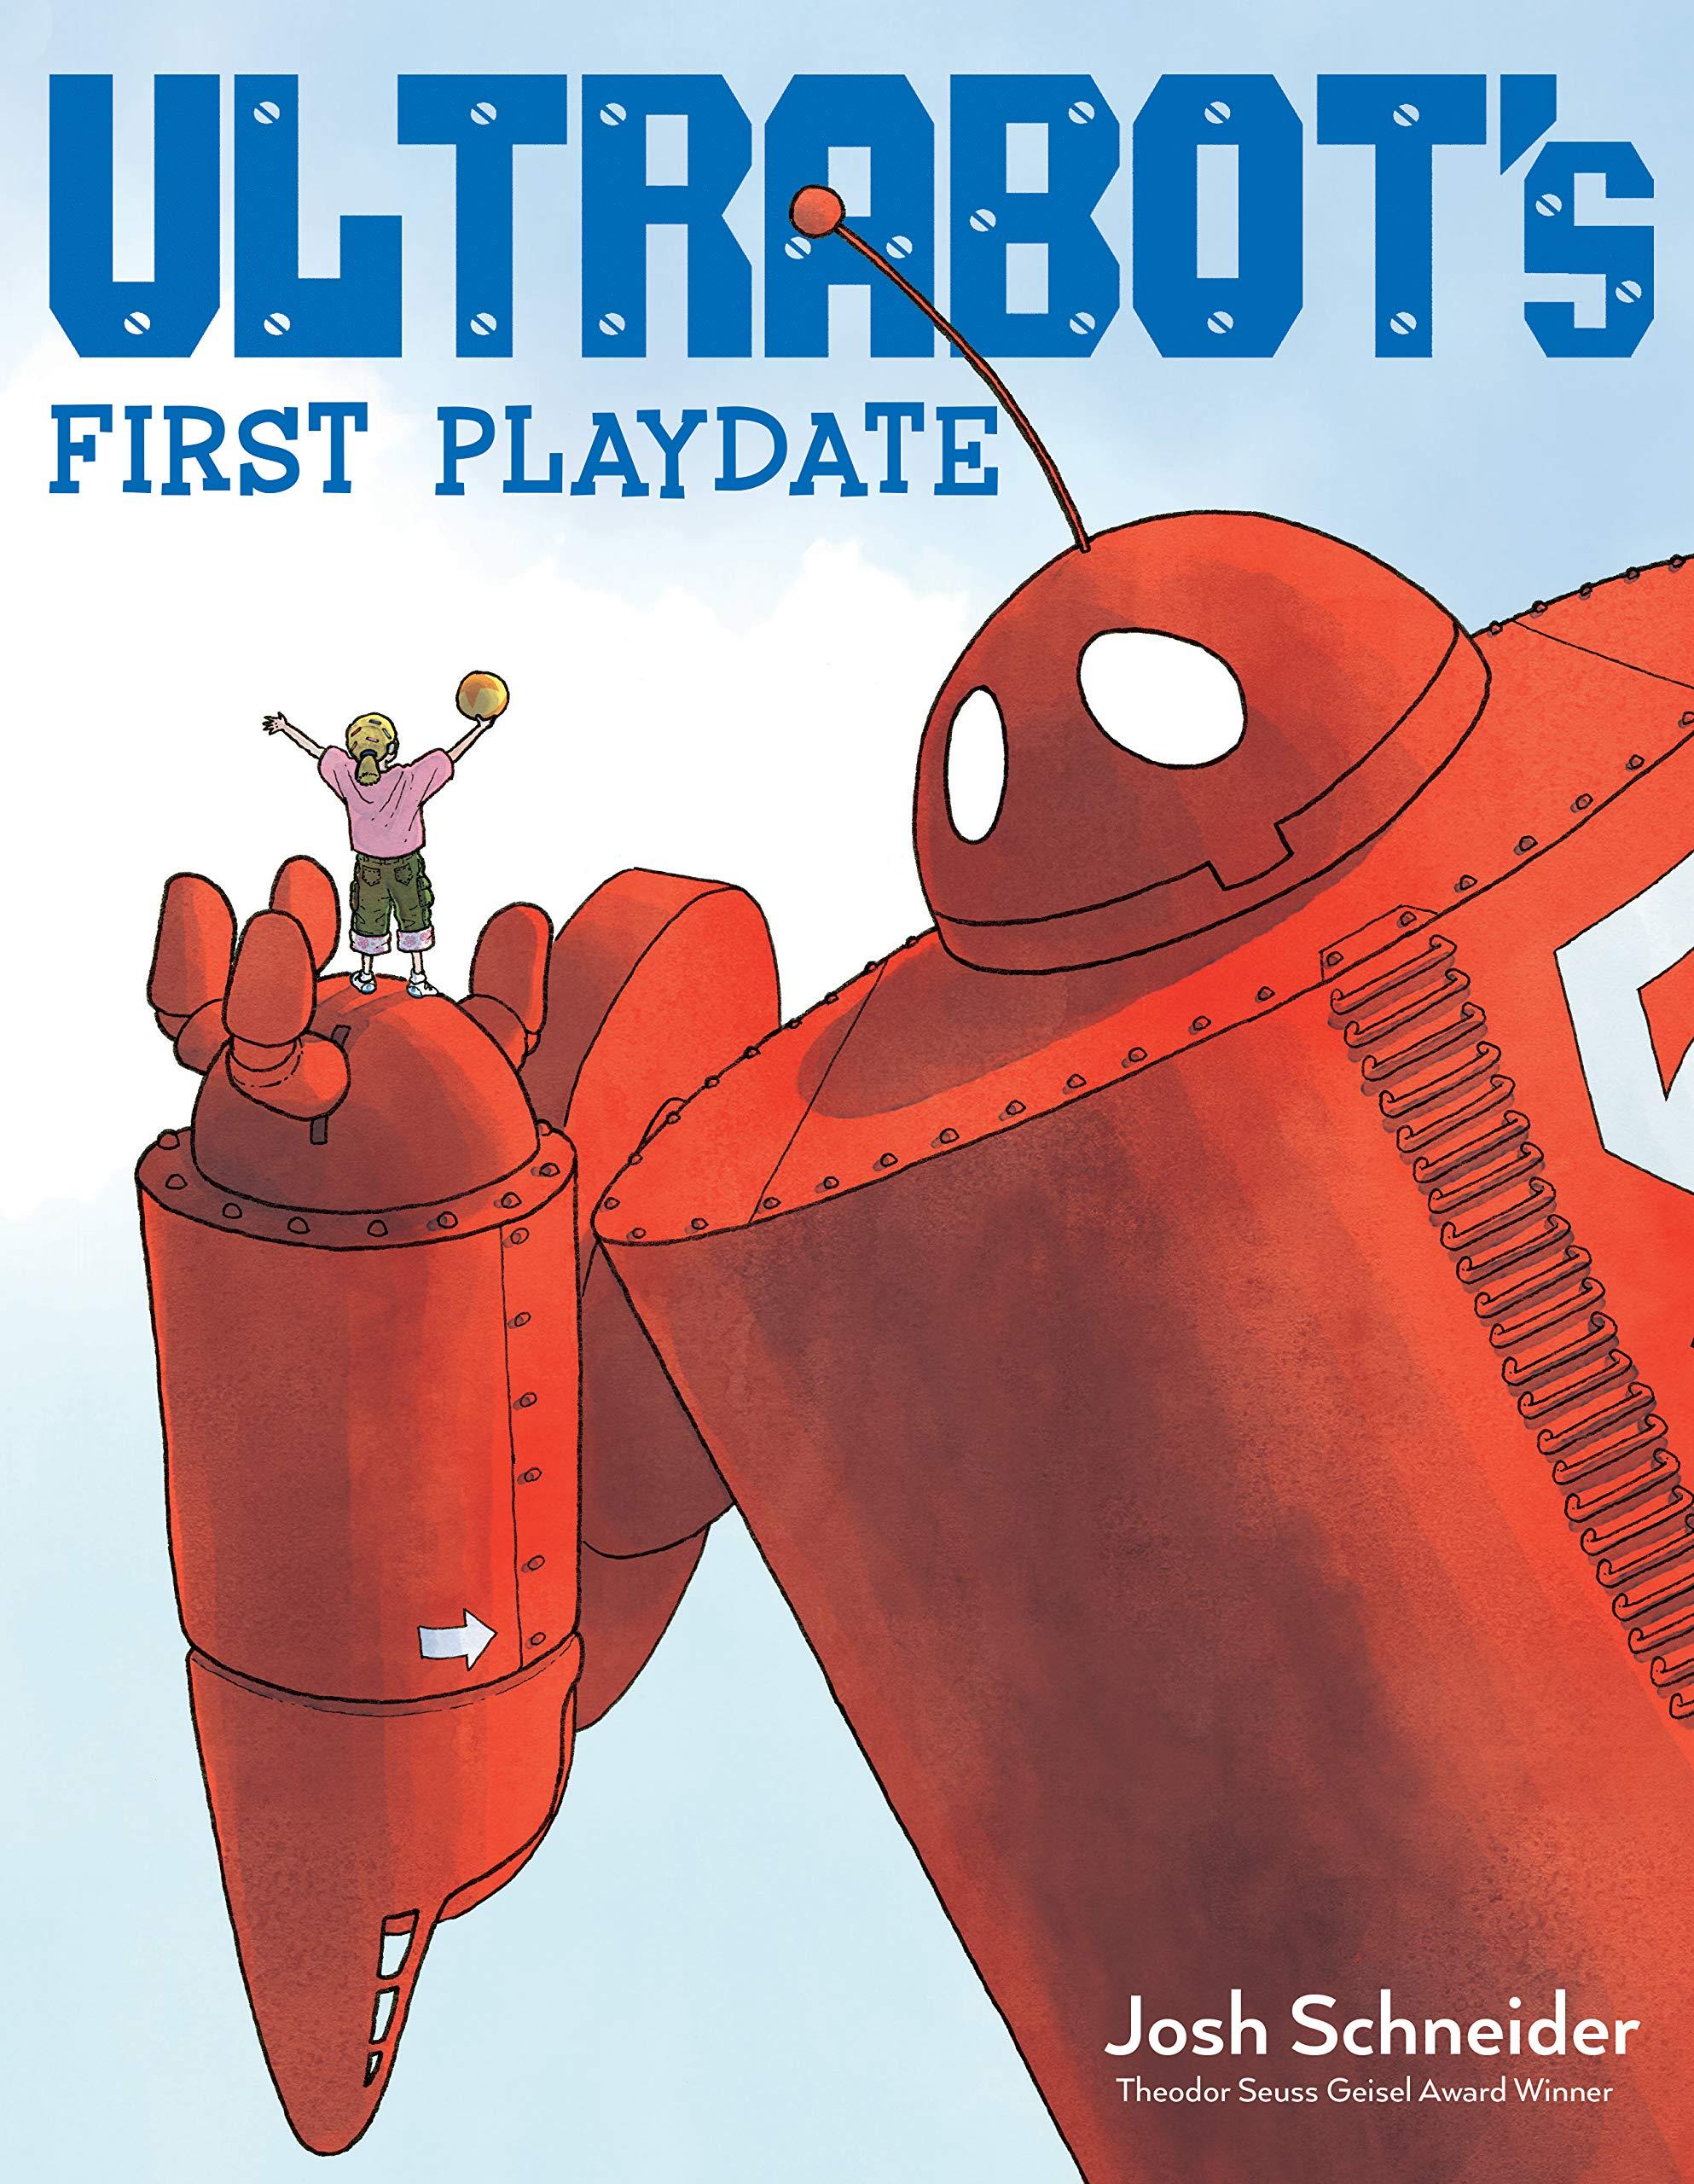 Schneider, Josh 2019_07 - ULTRABOT'S FIRST PLAYDATE - PB - RLM PR.jpg